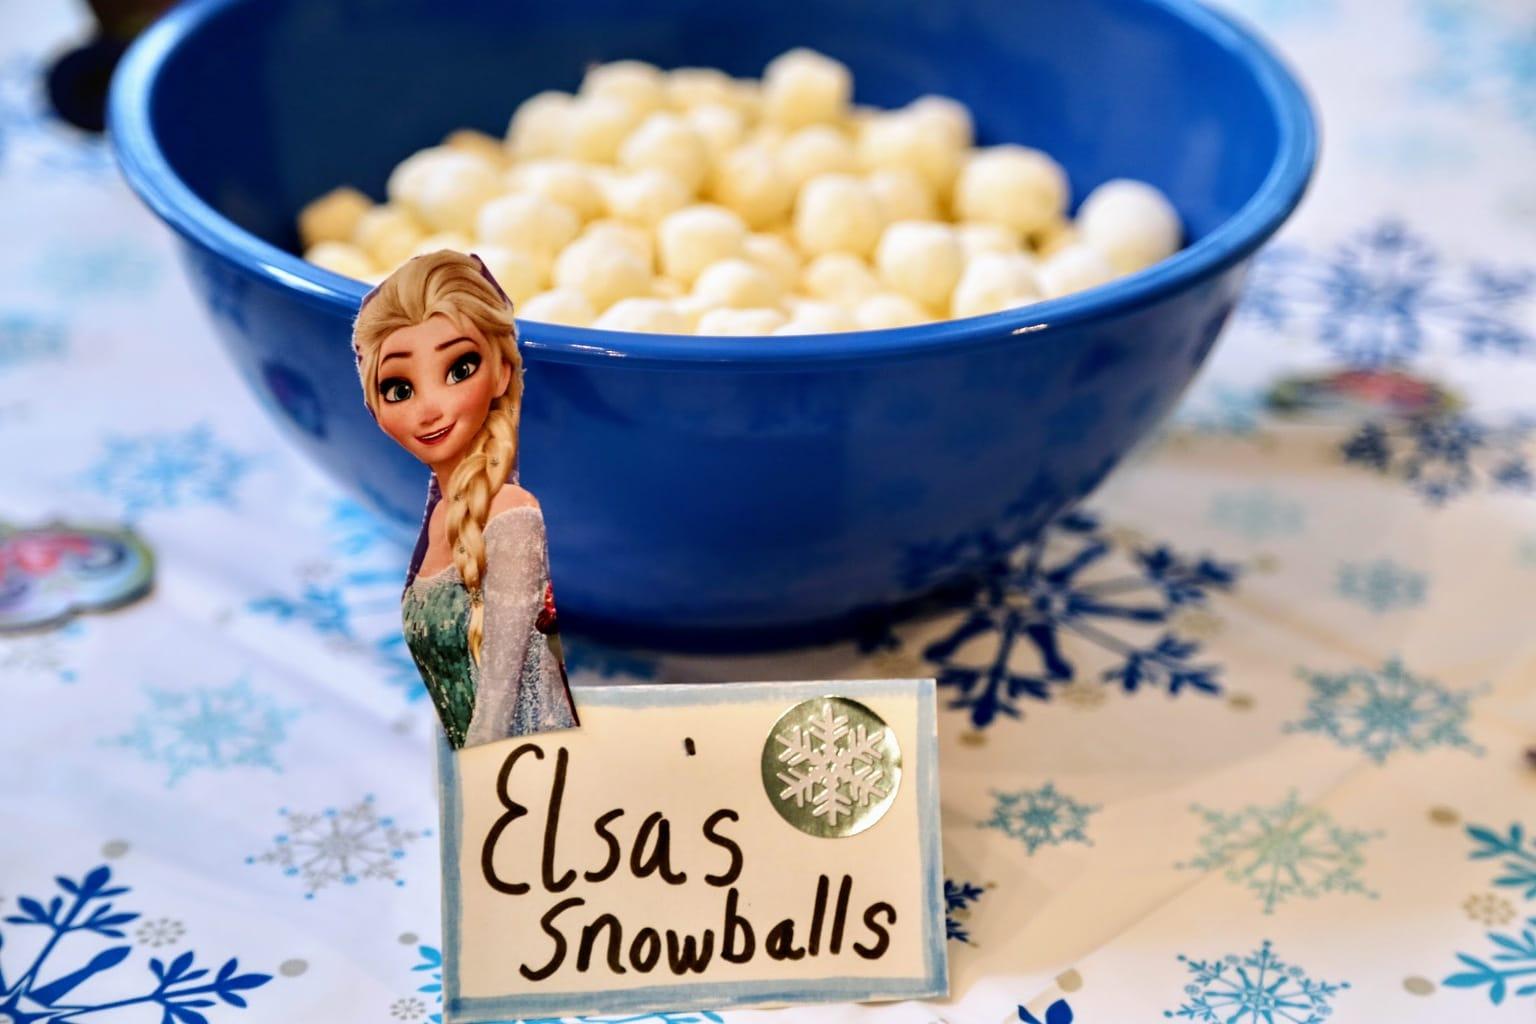 Elsa snowball snack